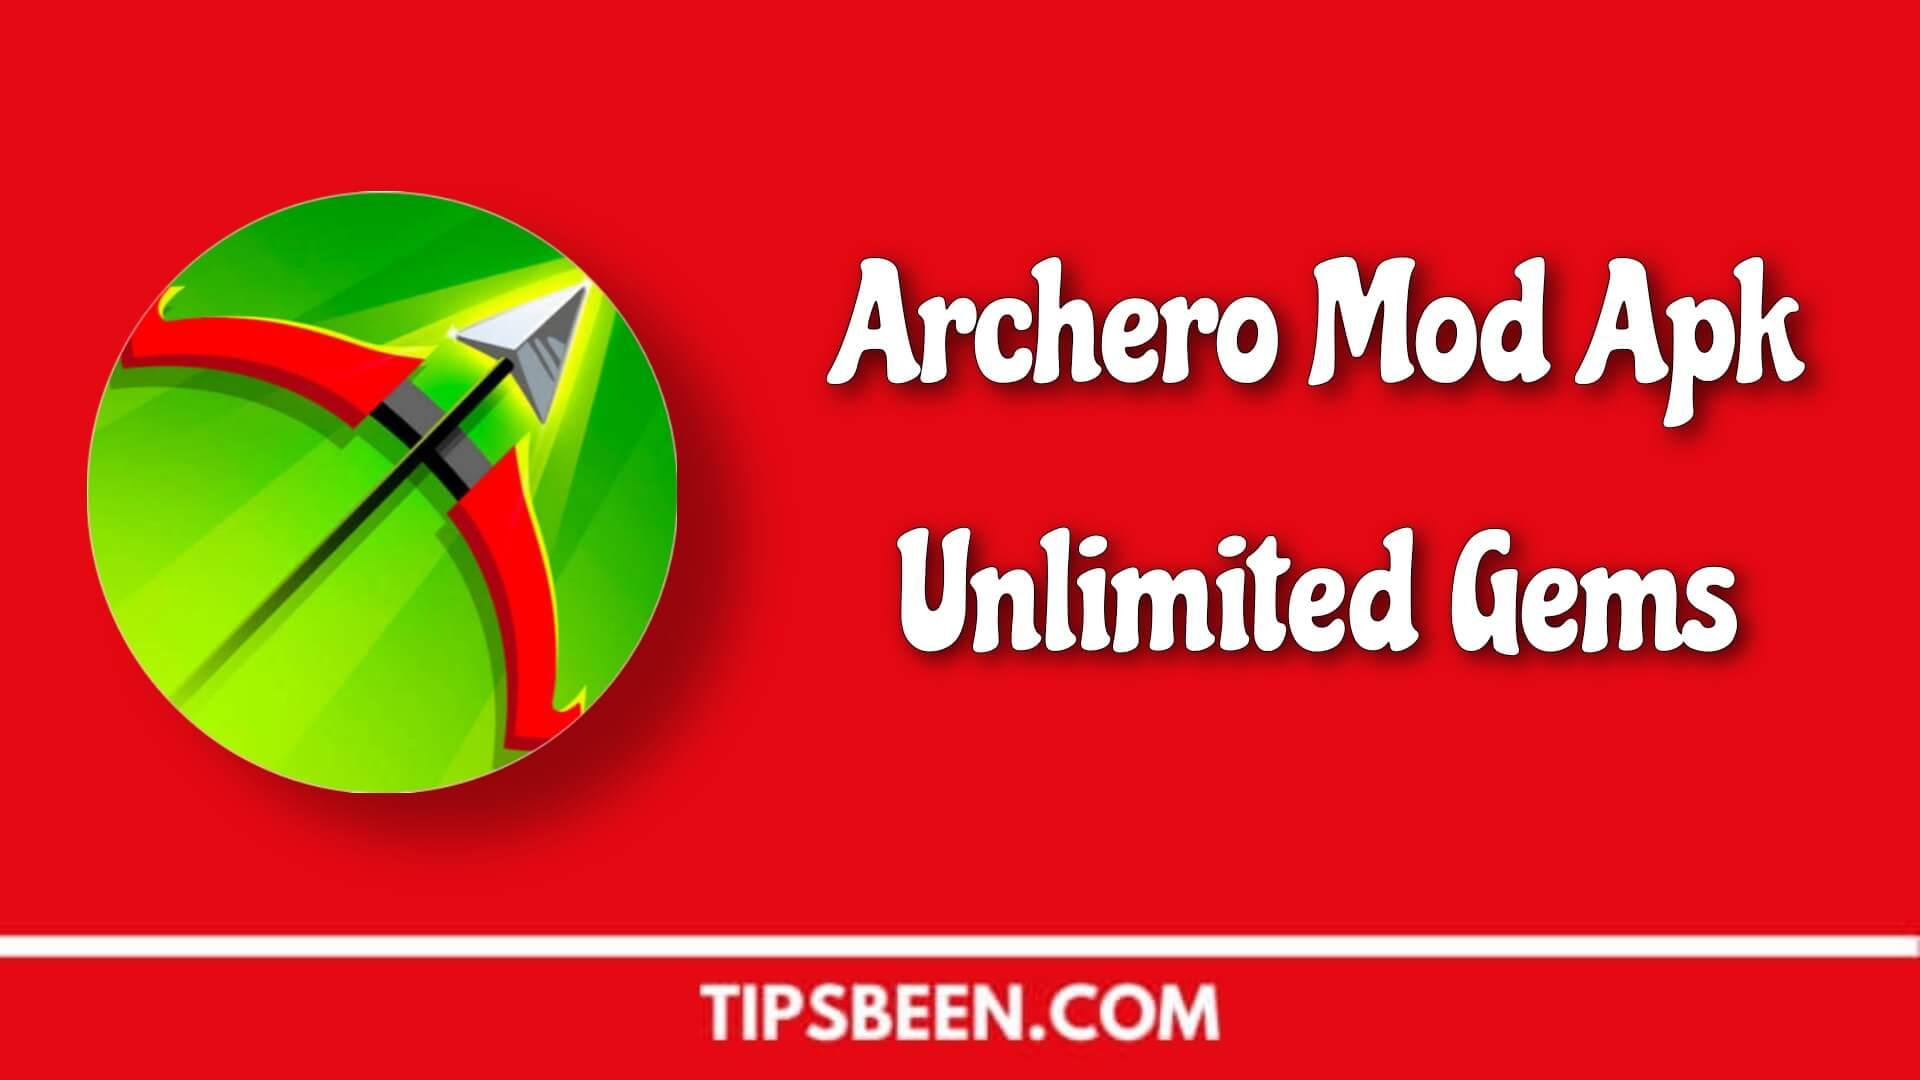 Archero Mod Apk 2.2.3 Unlimited Money & Gems, High Damage 2020